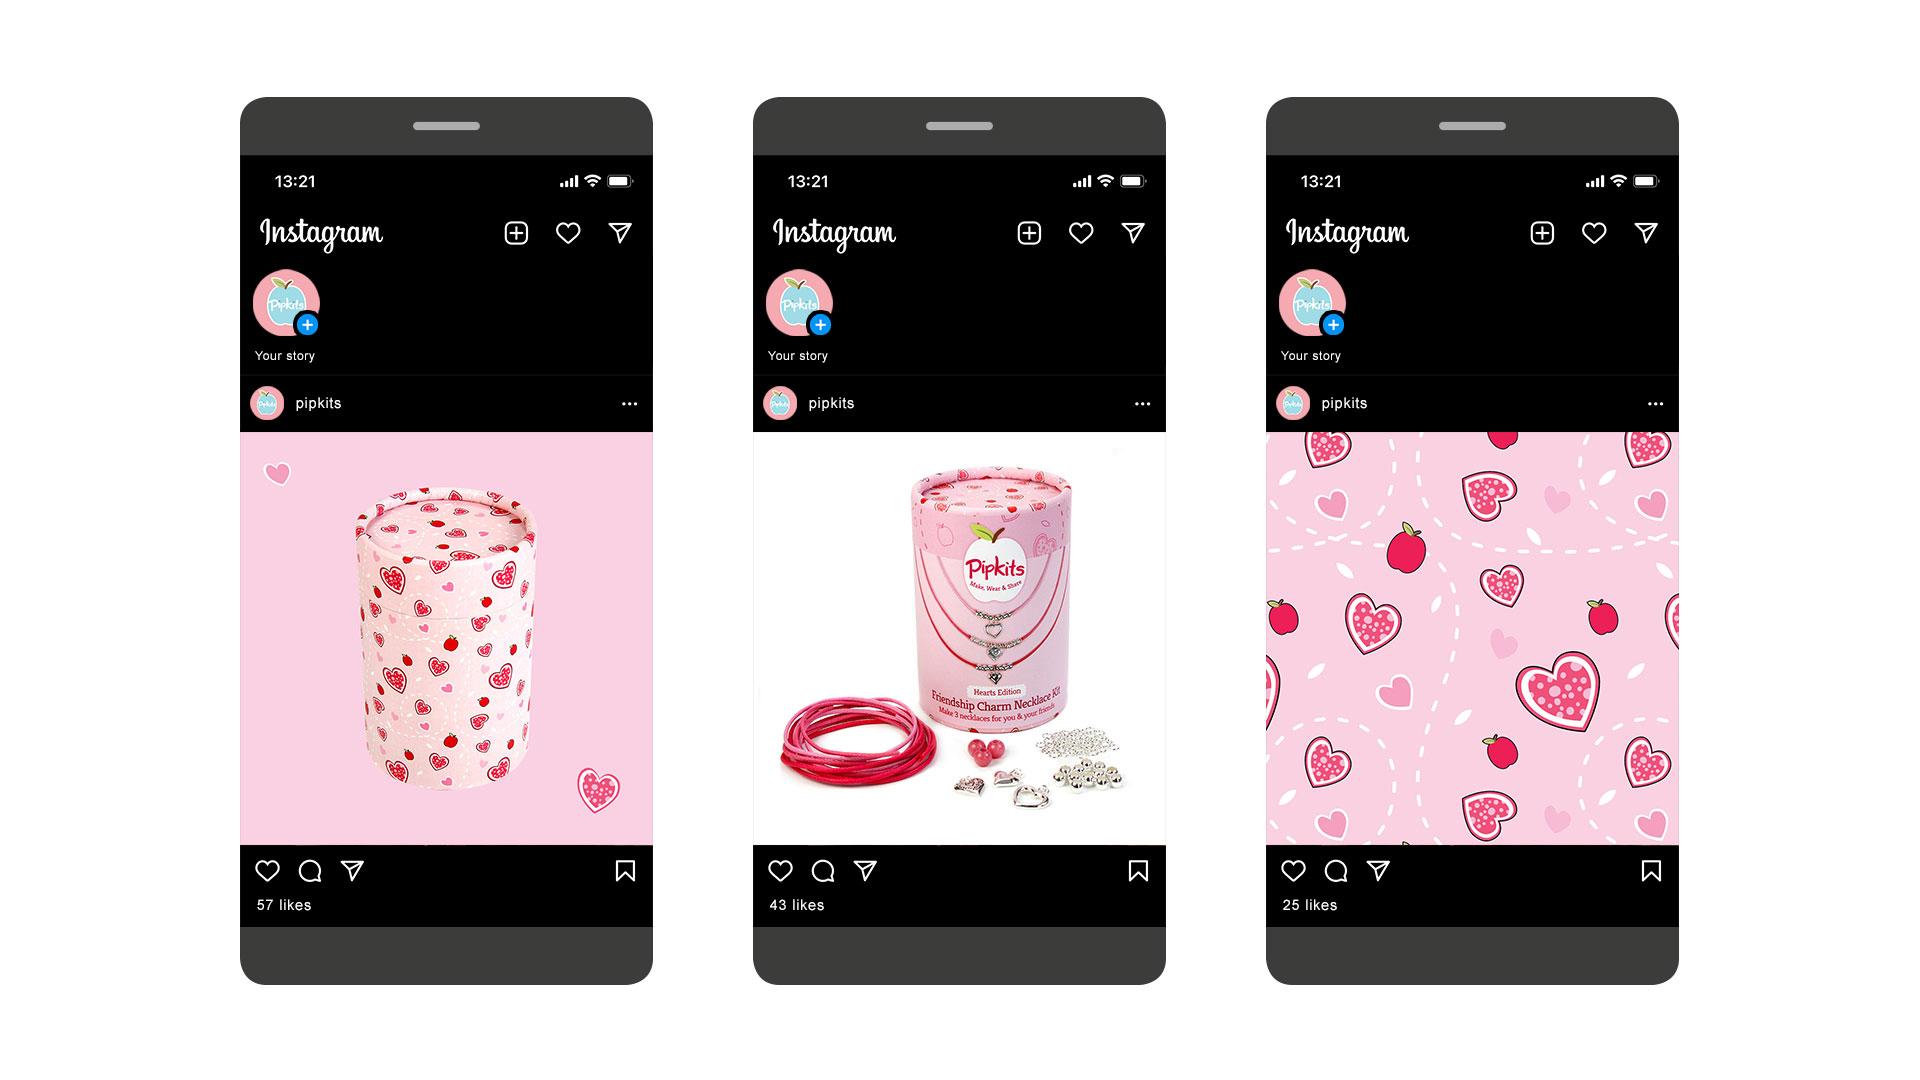 Pipkits-Instagram-Valentines